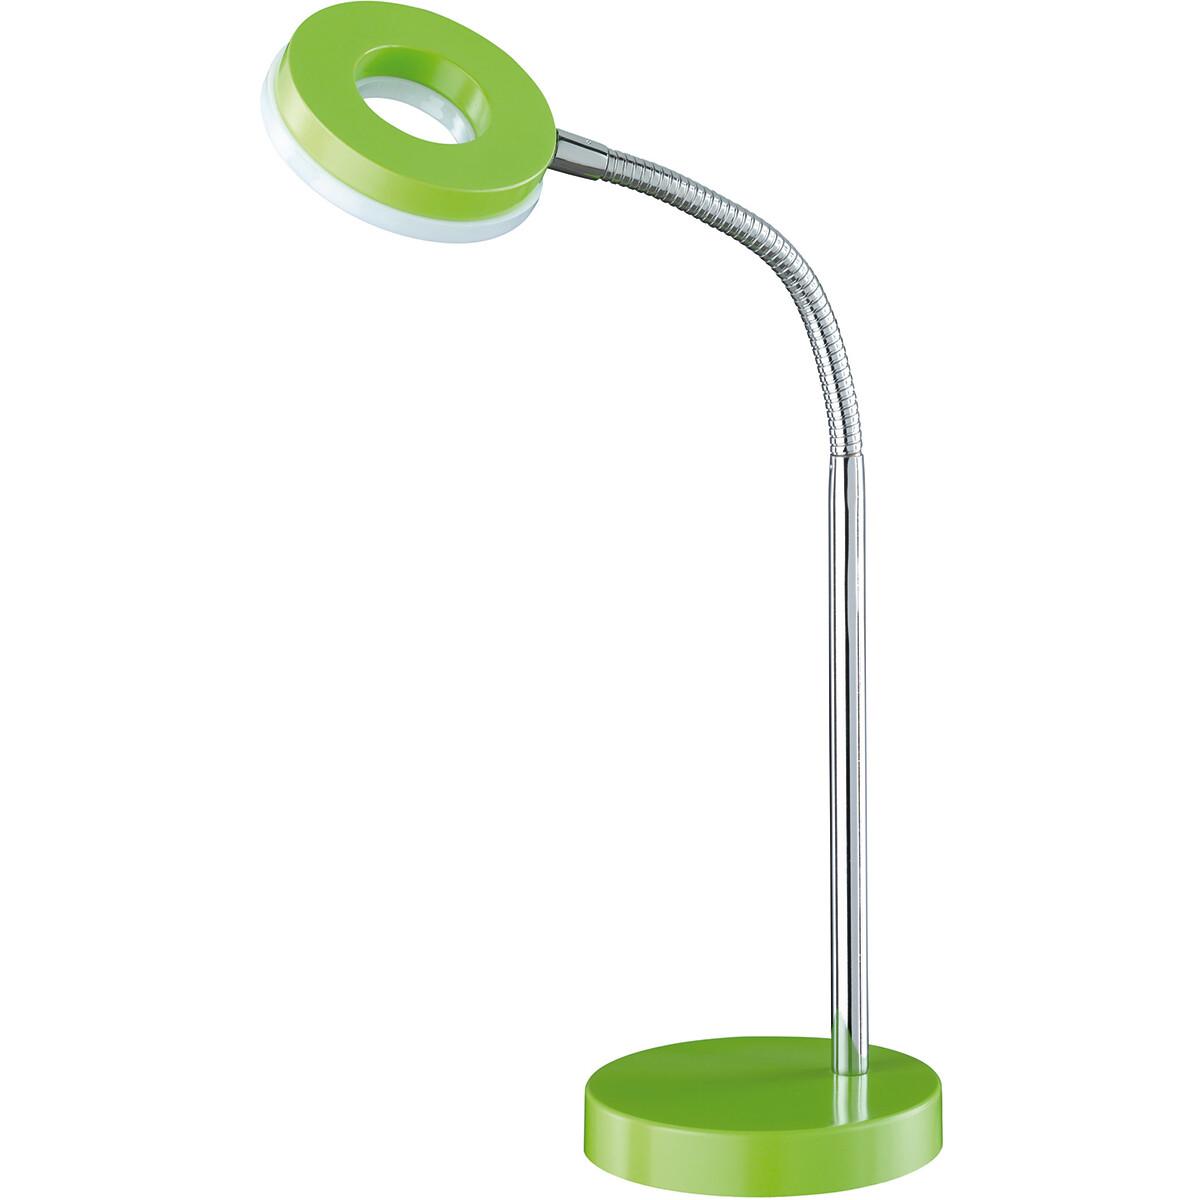 LED Tafellamp - Tafelverlichting - Trion Renny - 4W - Warm Wit 3000K - Rond - Mat Groen - Aluminium